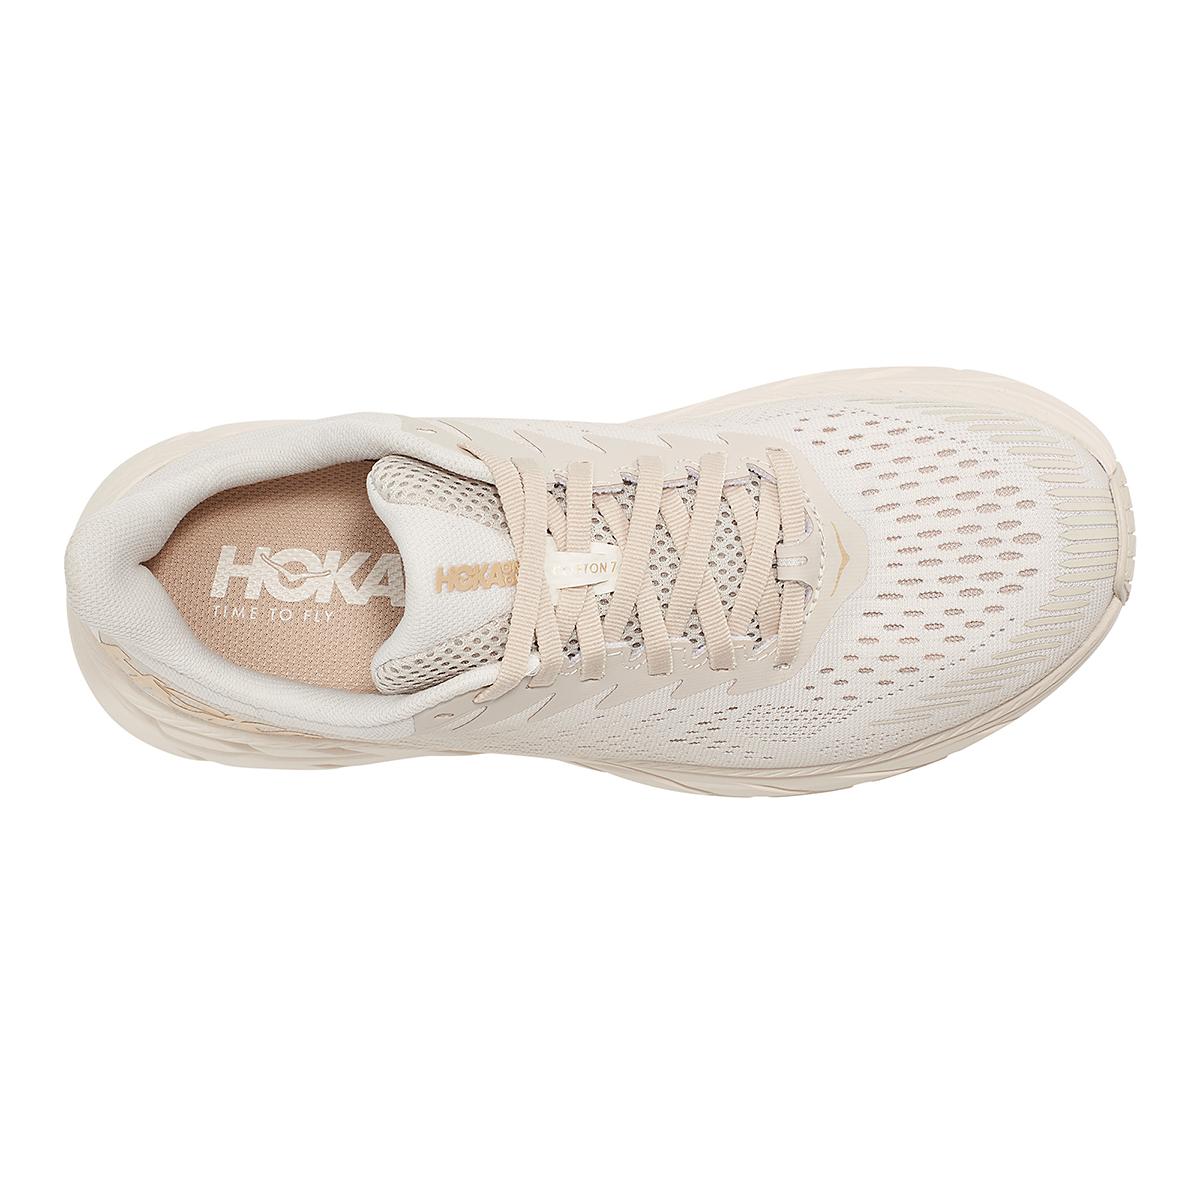 Women's Hoka One One Clifton 7 Running Shoe - Color: Almond Milk/Bronze - Size: 5 - Width: Regular, Almond Milk/Bronze, large, image 5